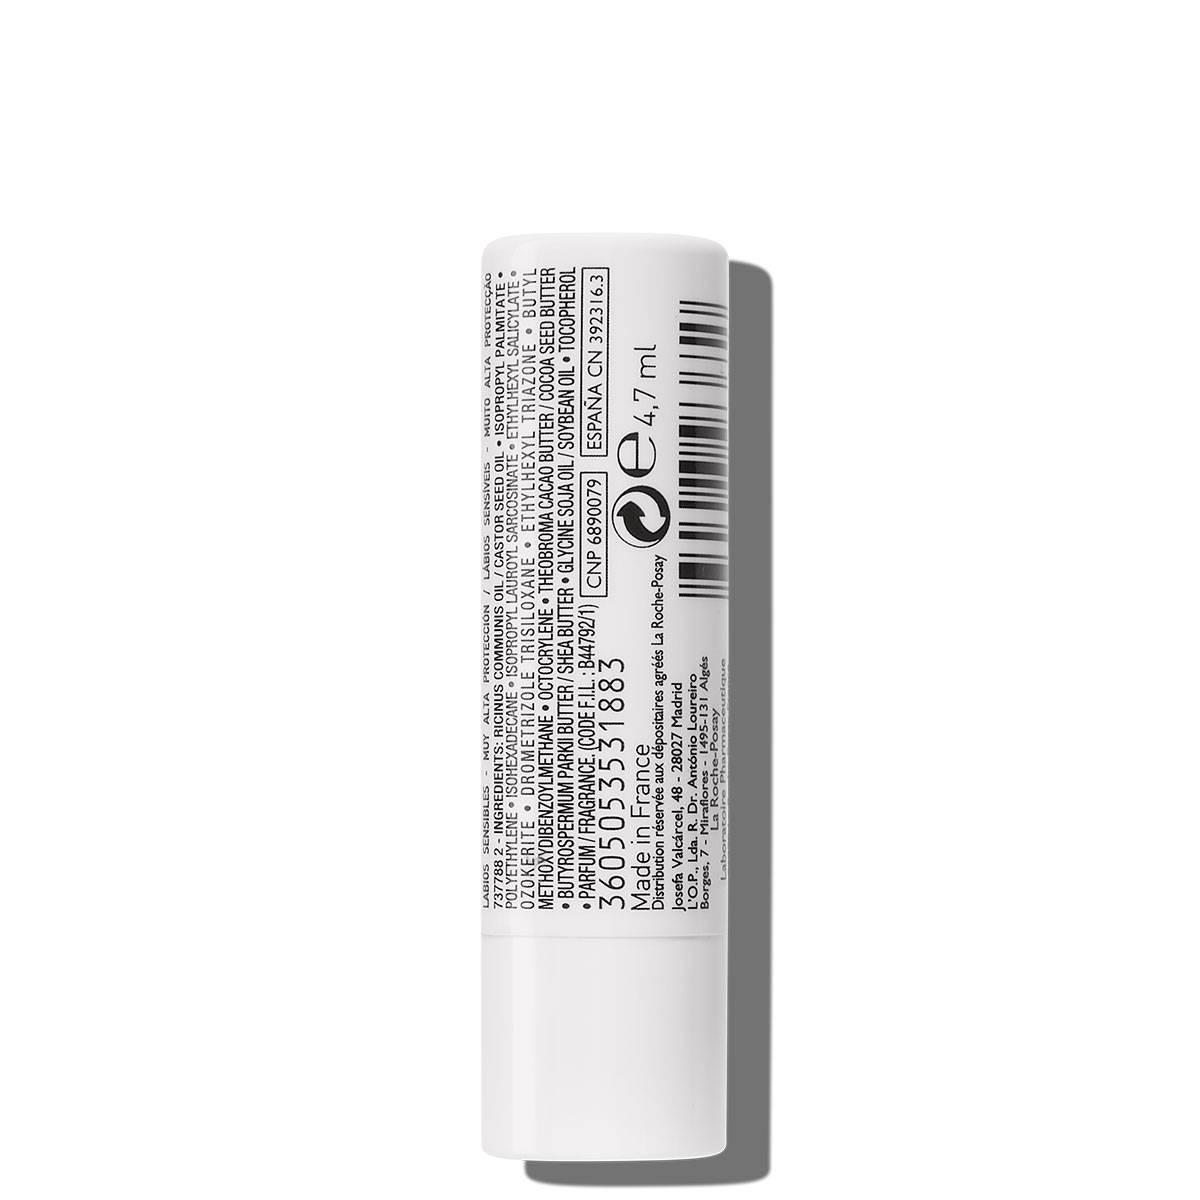 La Roche Posay Tuotesivu Aurinko Anthelios XL Lips Stick Spf50 Sensitive